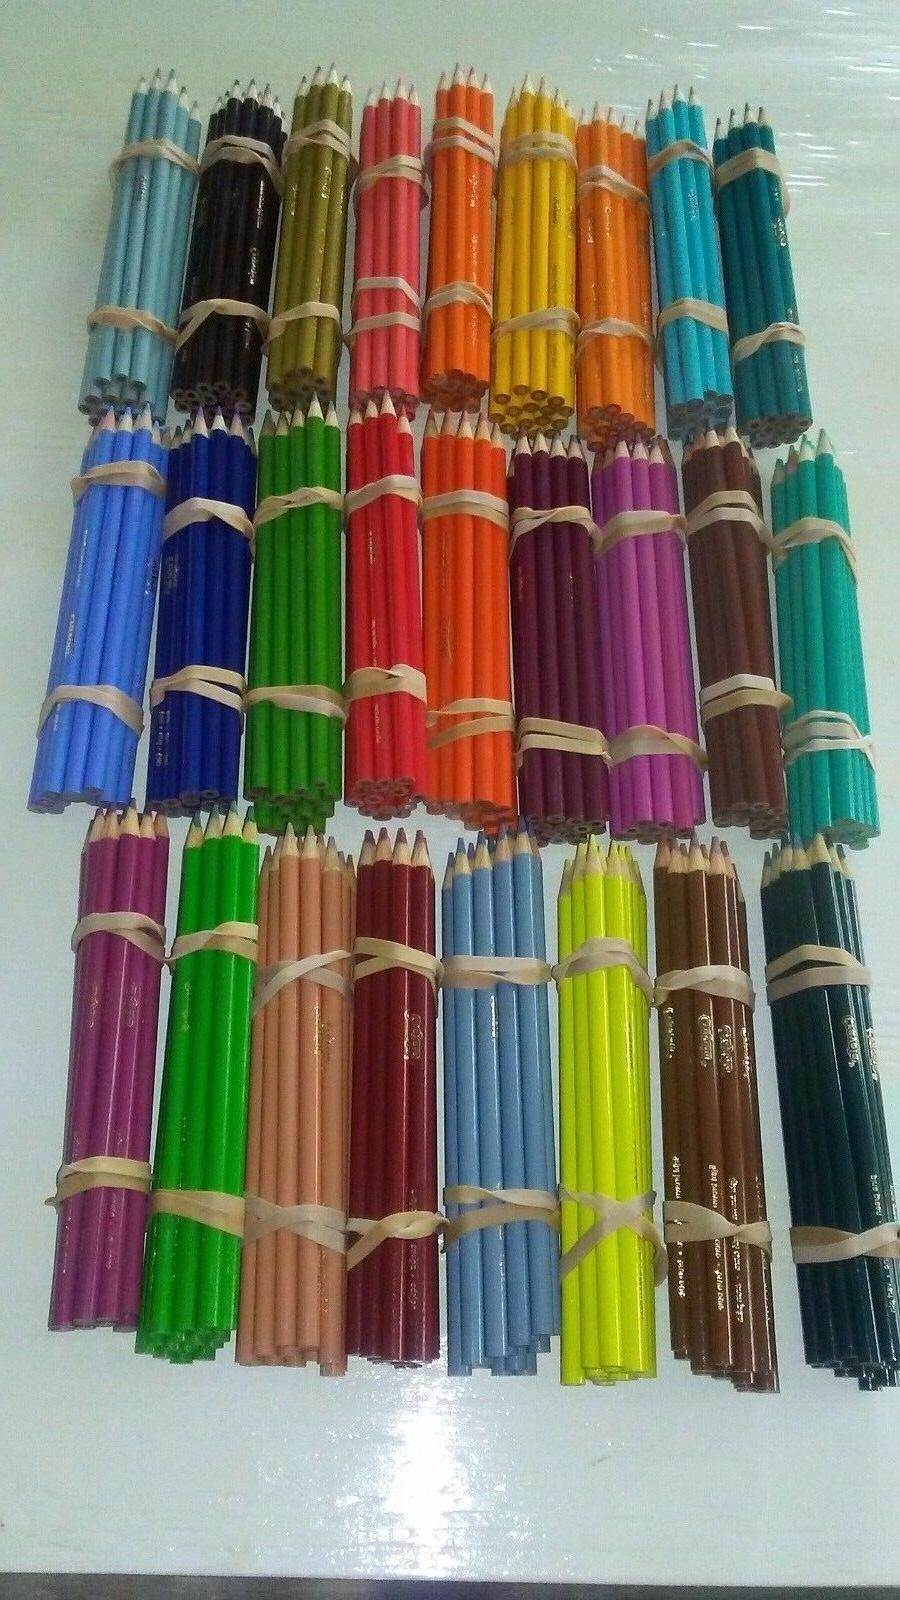 New Crayola Colored 16 Single